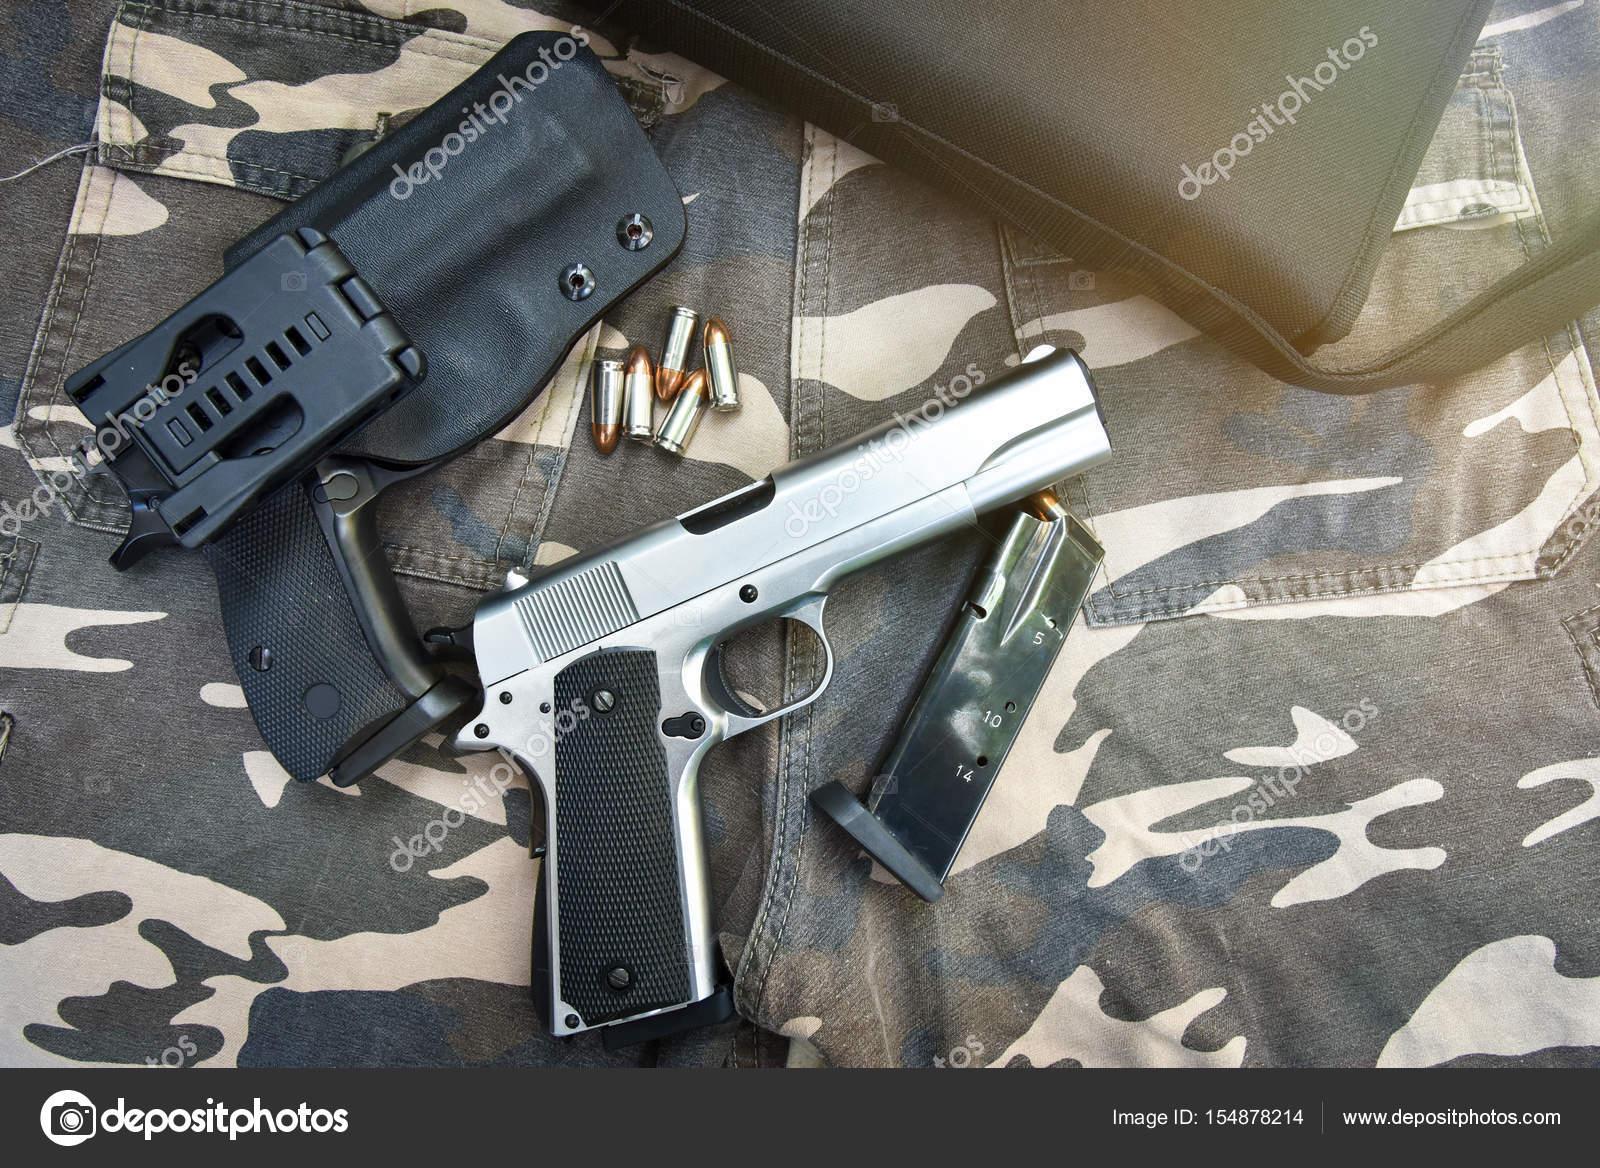 60ccde5f09 Δύο ημι-αυτόματο πιστόλια και τσάντα σε στρατιώτη παντελόνι παραλλαγής —  Εικόνα από ...